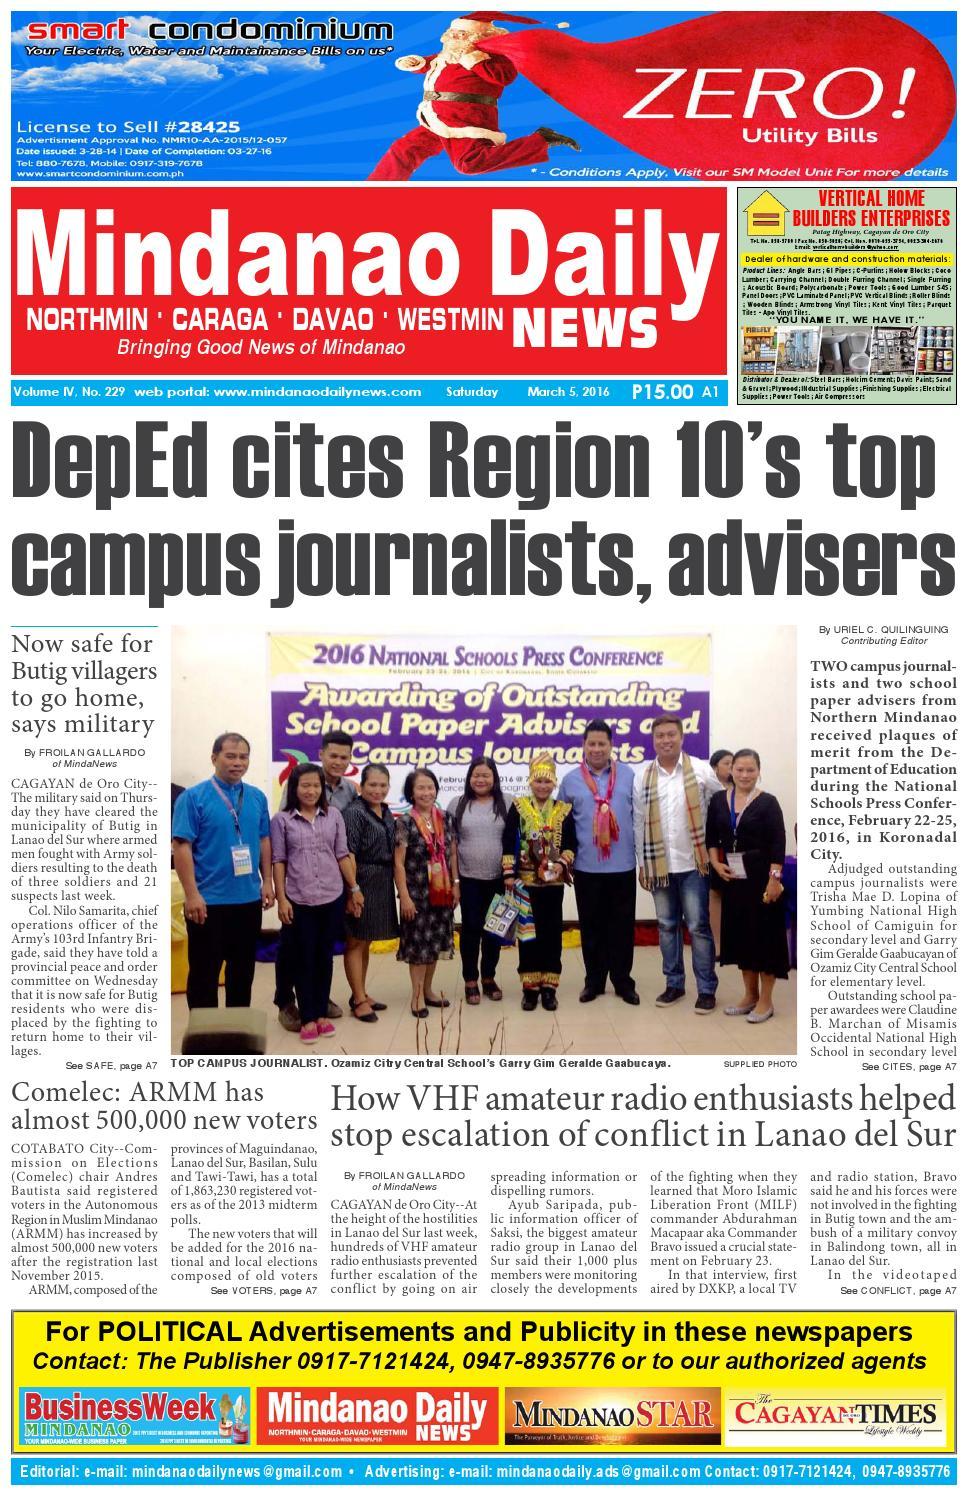 Mindanao Daily Northmin March 5 2016 By Dante Sudaria Issuu Del City Press Release